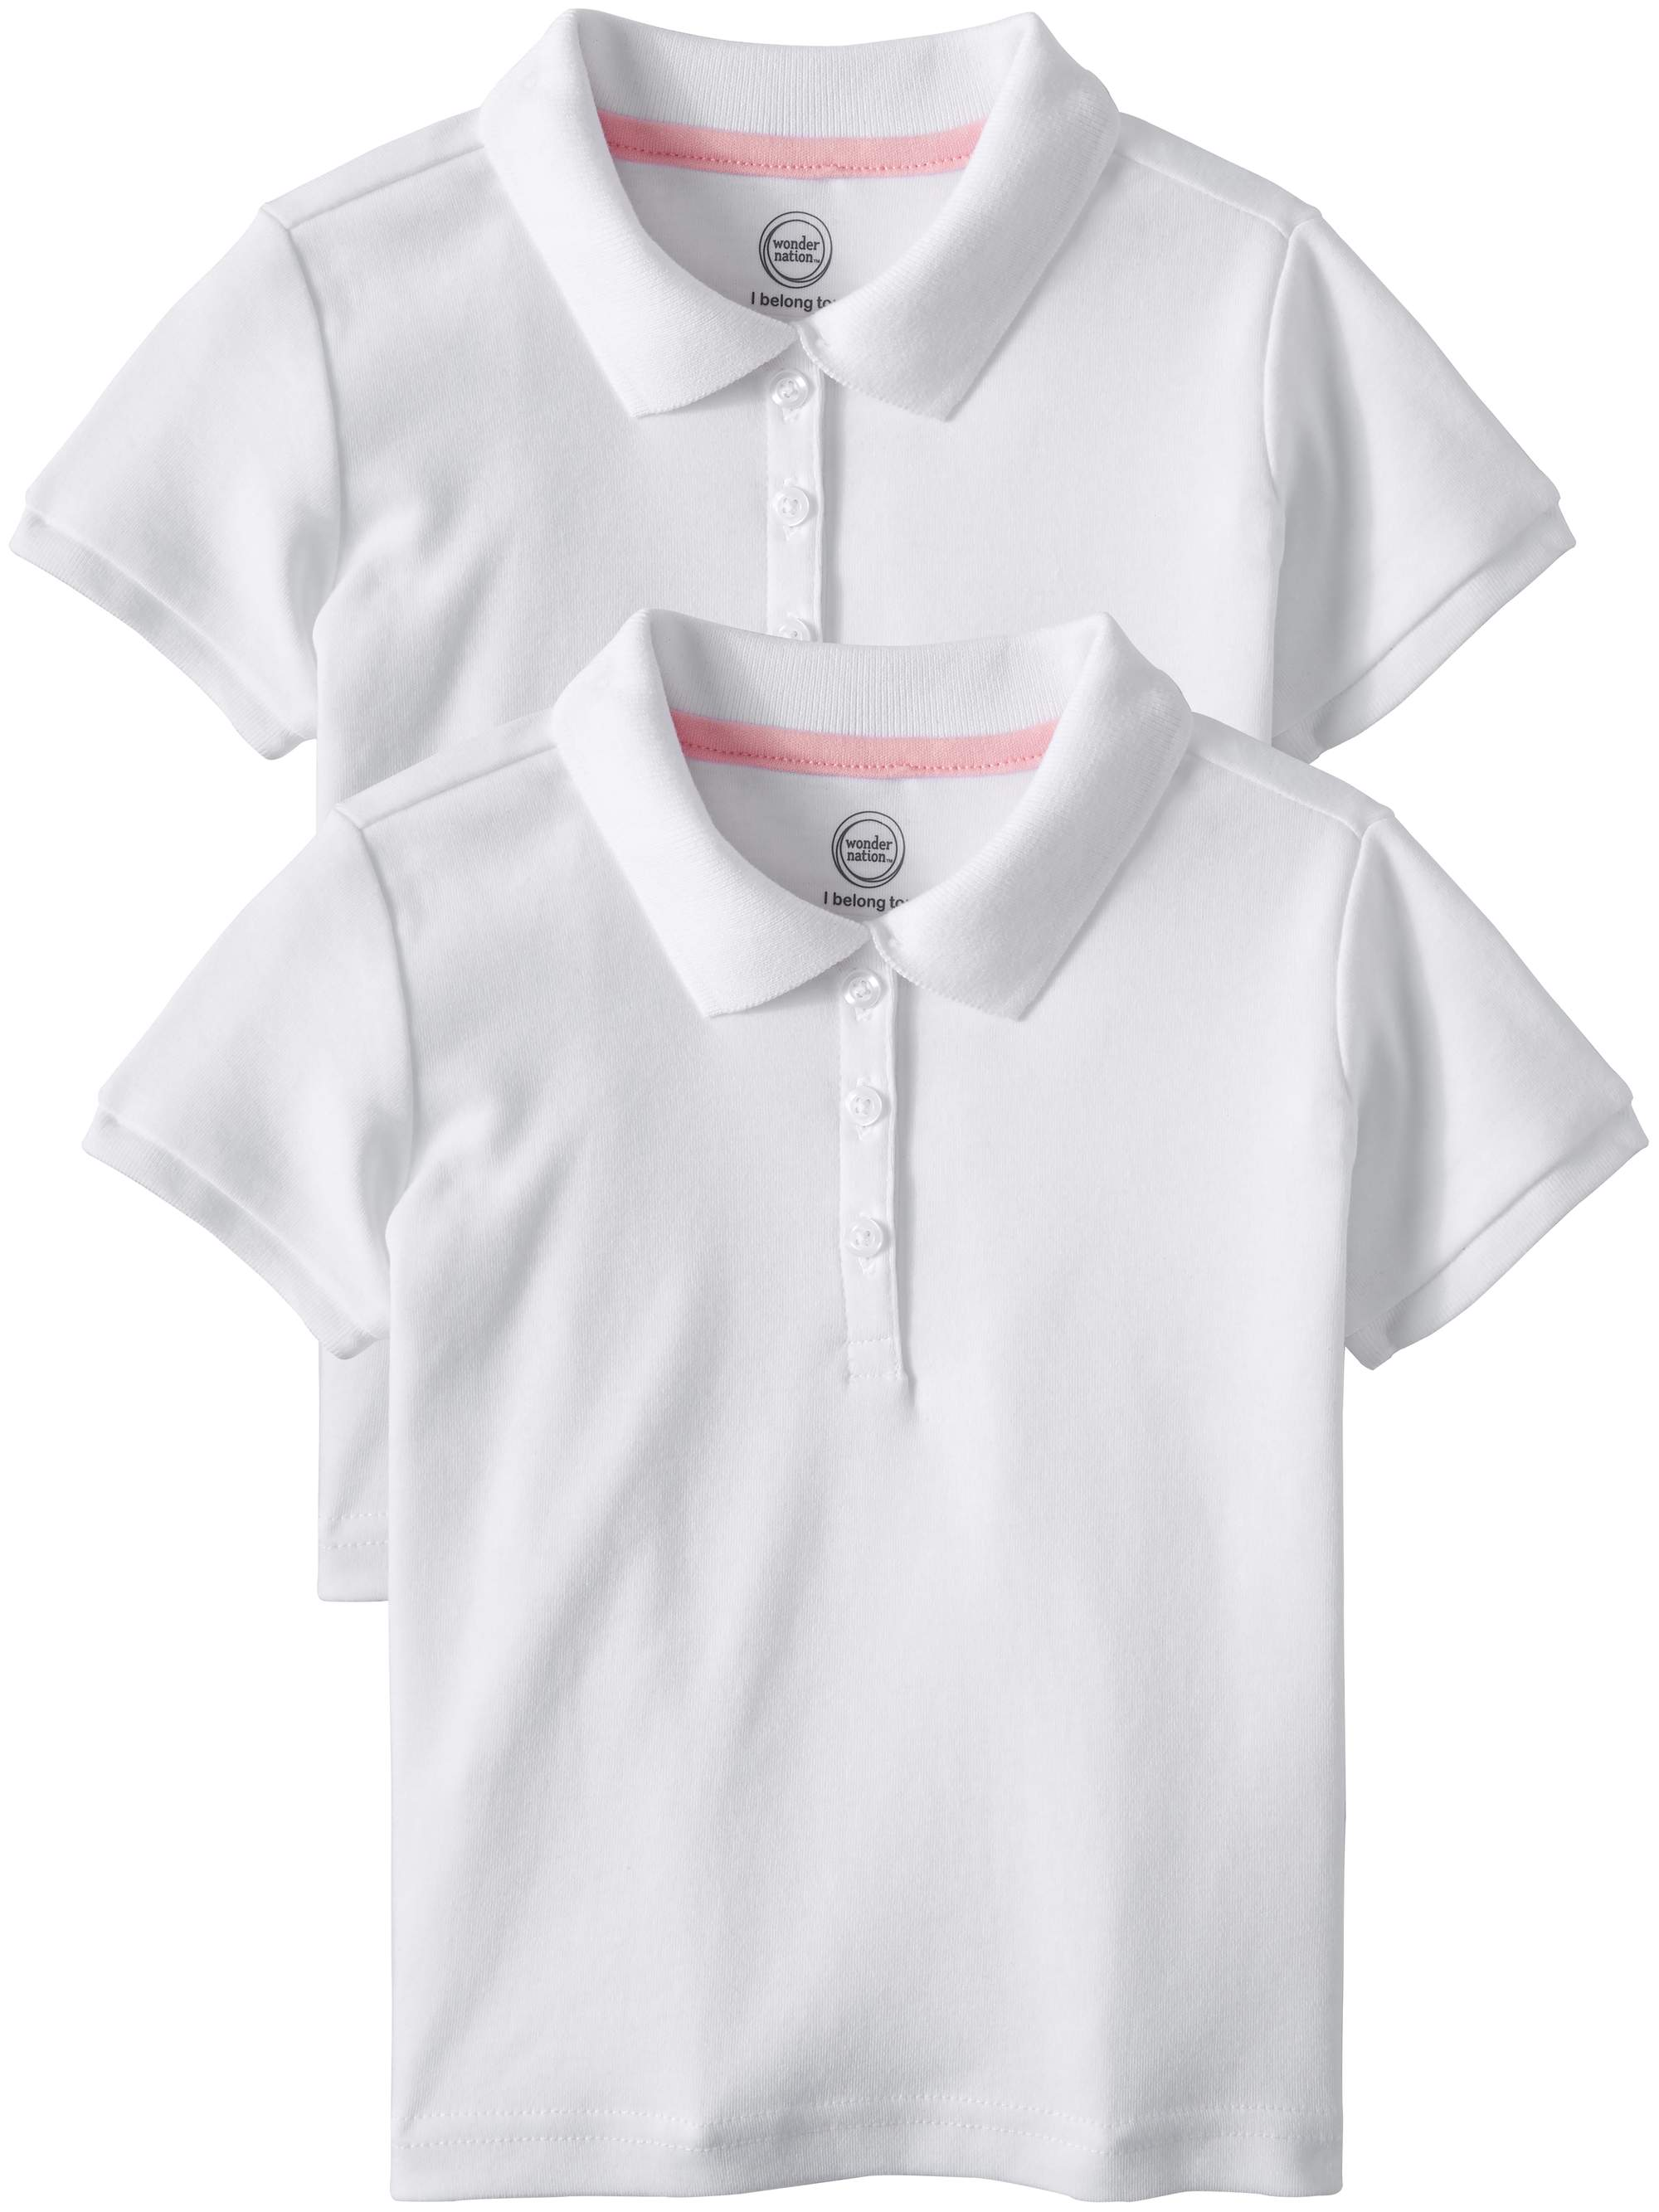 Toddler Girls School Uniform Short Sleeve Interlock Polo, 2-Pack Value Bundle